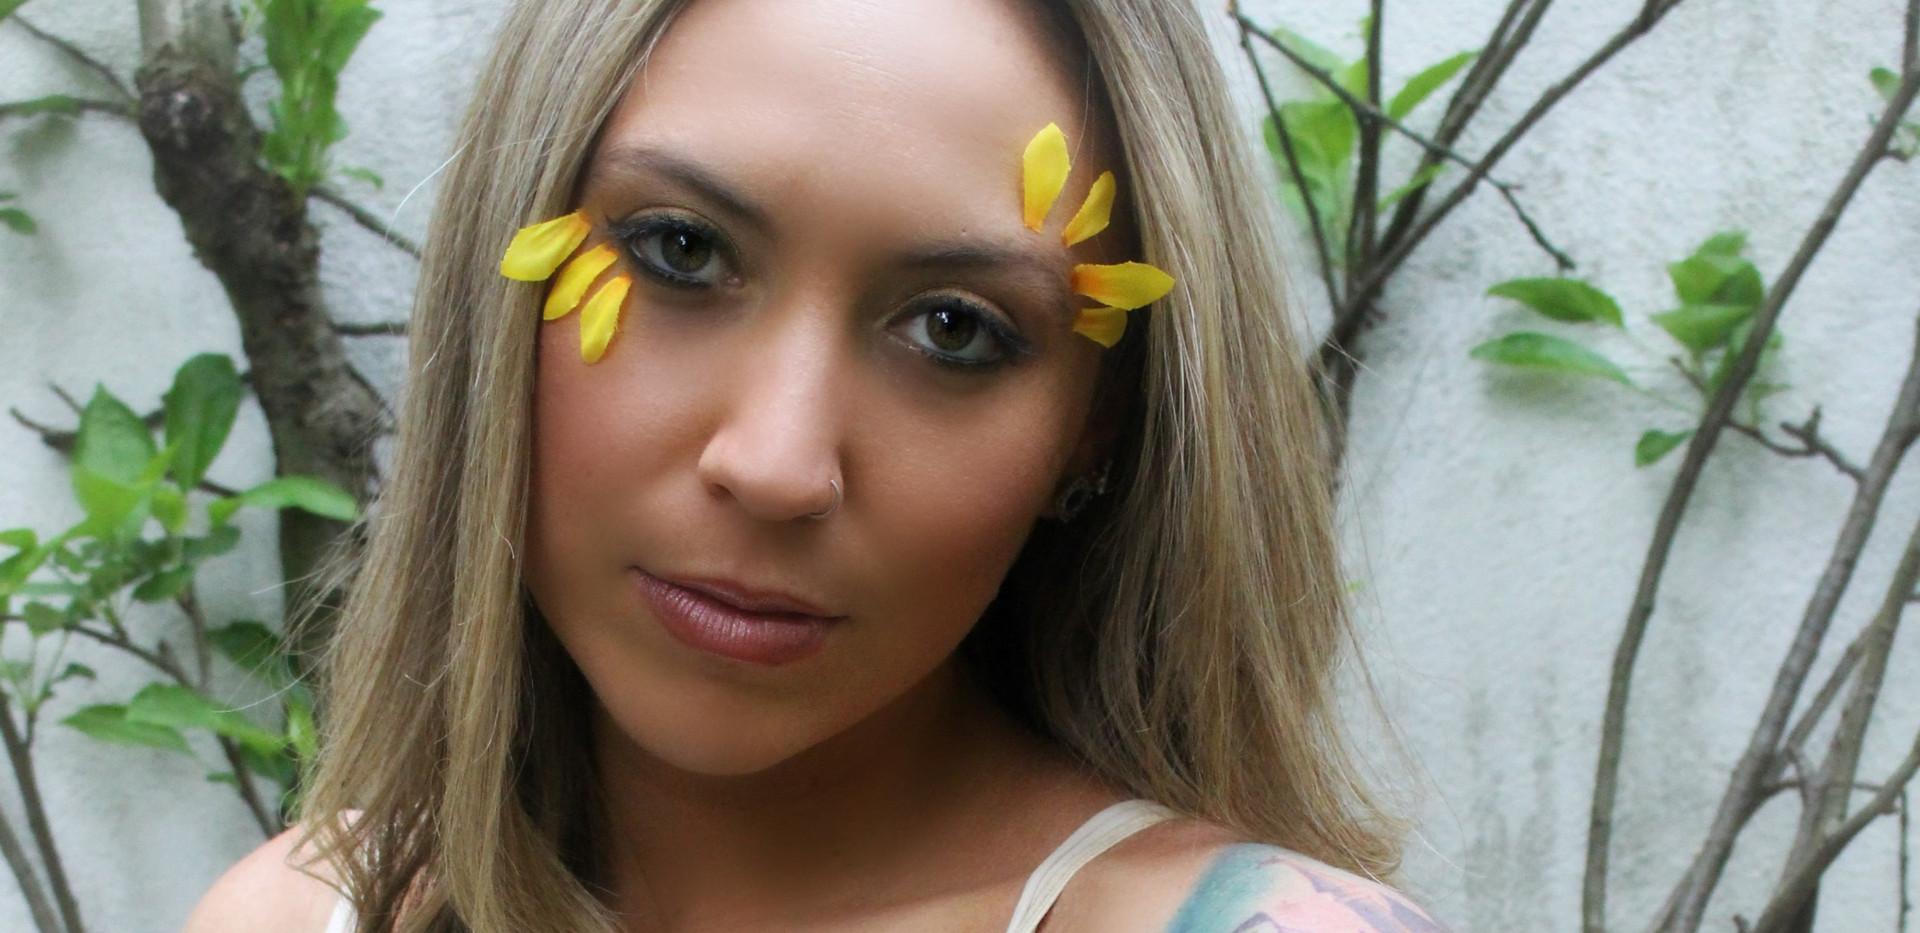 @hannah_banana25 for May's Floral Collab Photo: @mariannebphotography Makeup: @lipstickandmagictricks